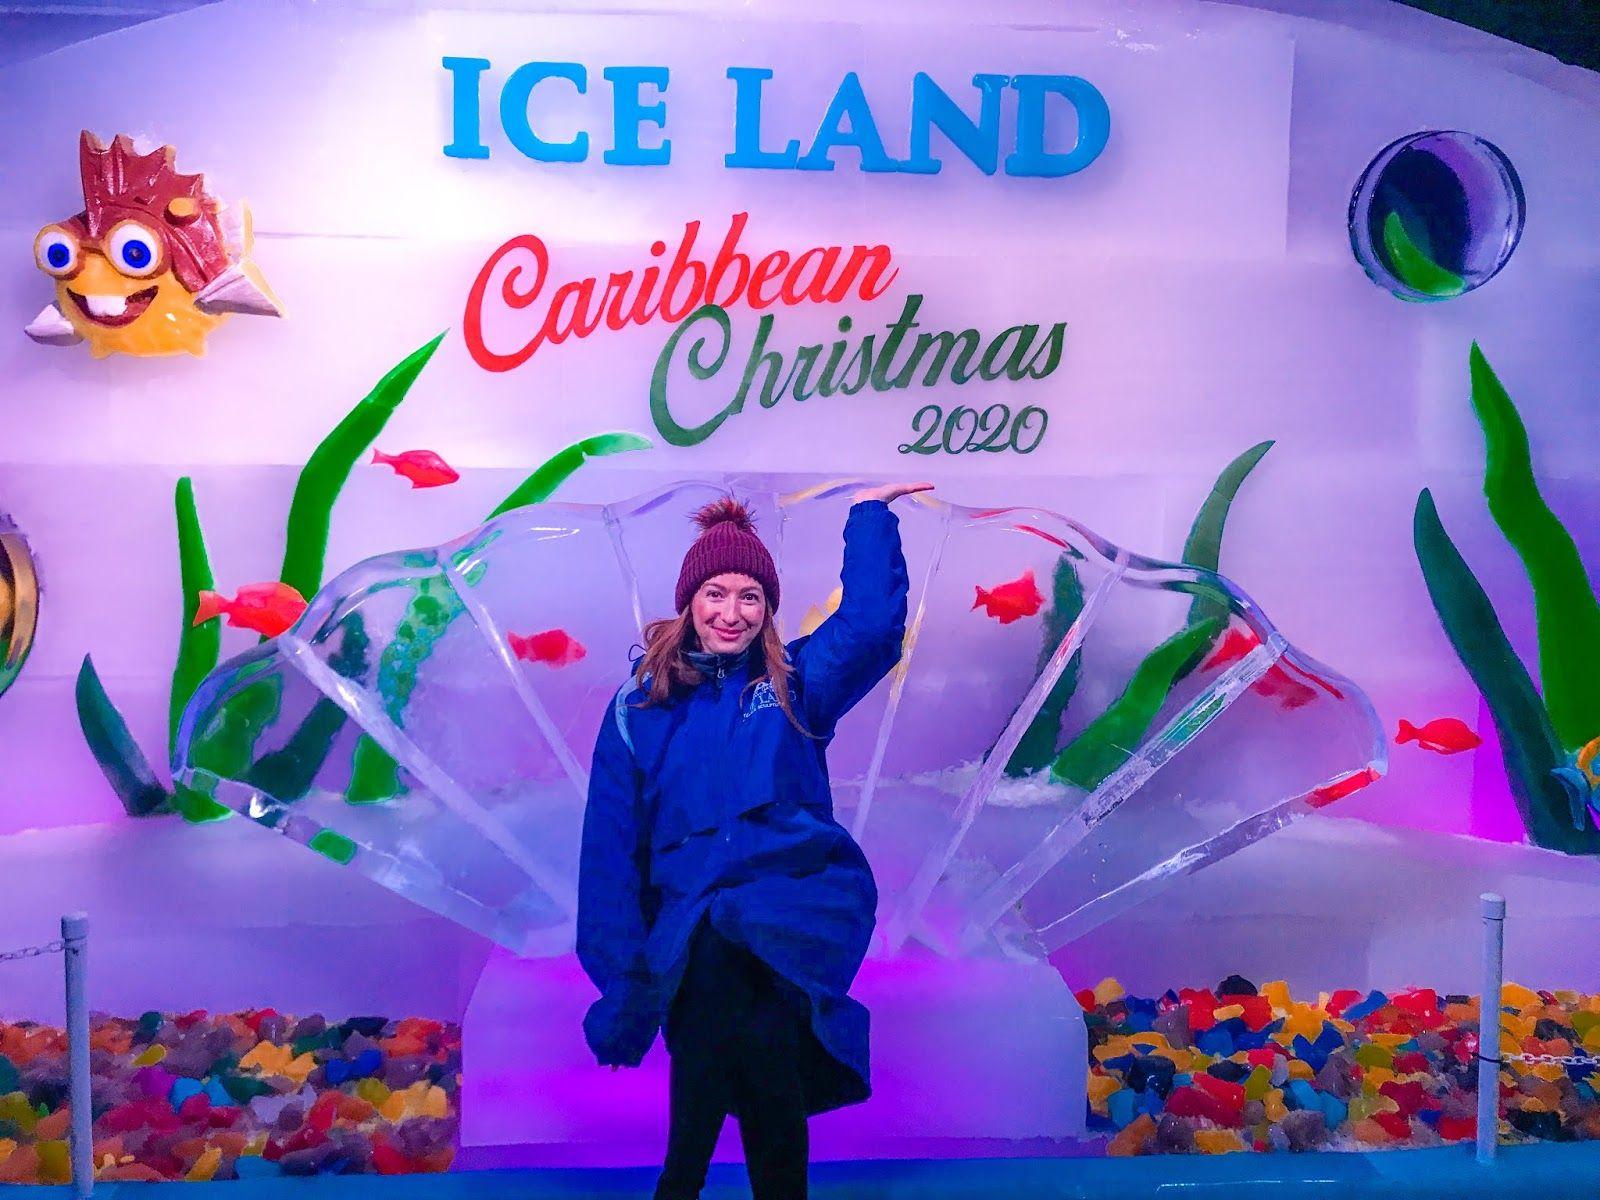 66074676179761b98f7e5eb29d1dbd3c - Moody Gardens Iceland And Festival Of Lights